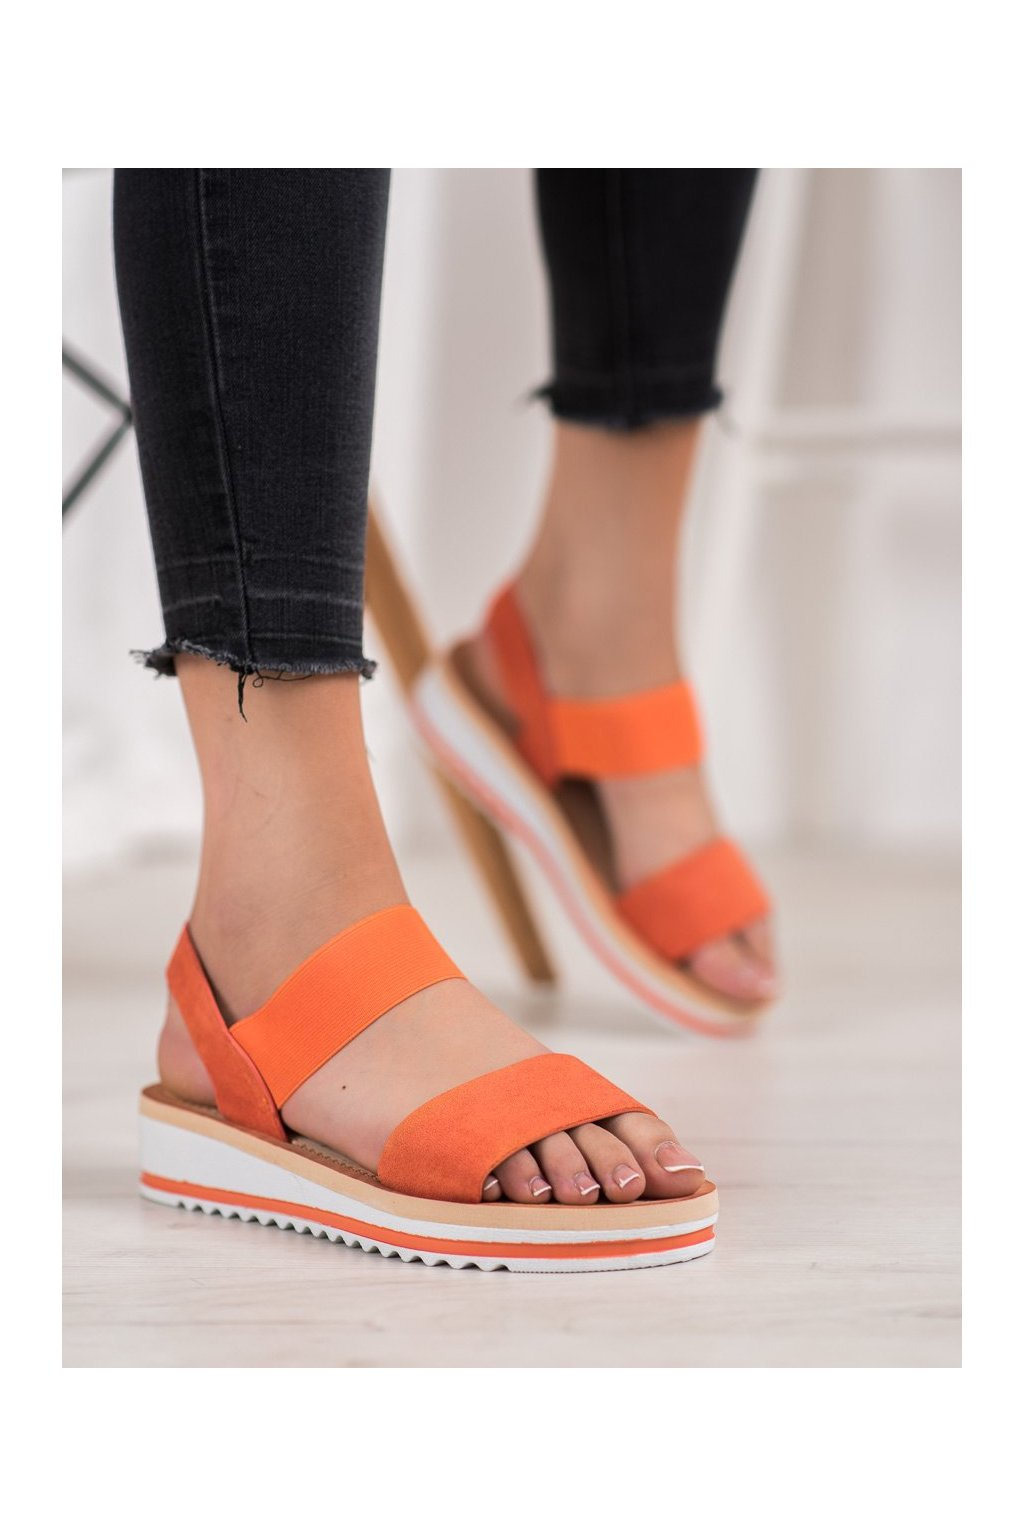 Oranžové sandále Mannika NJSK E008OR